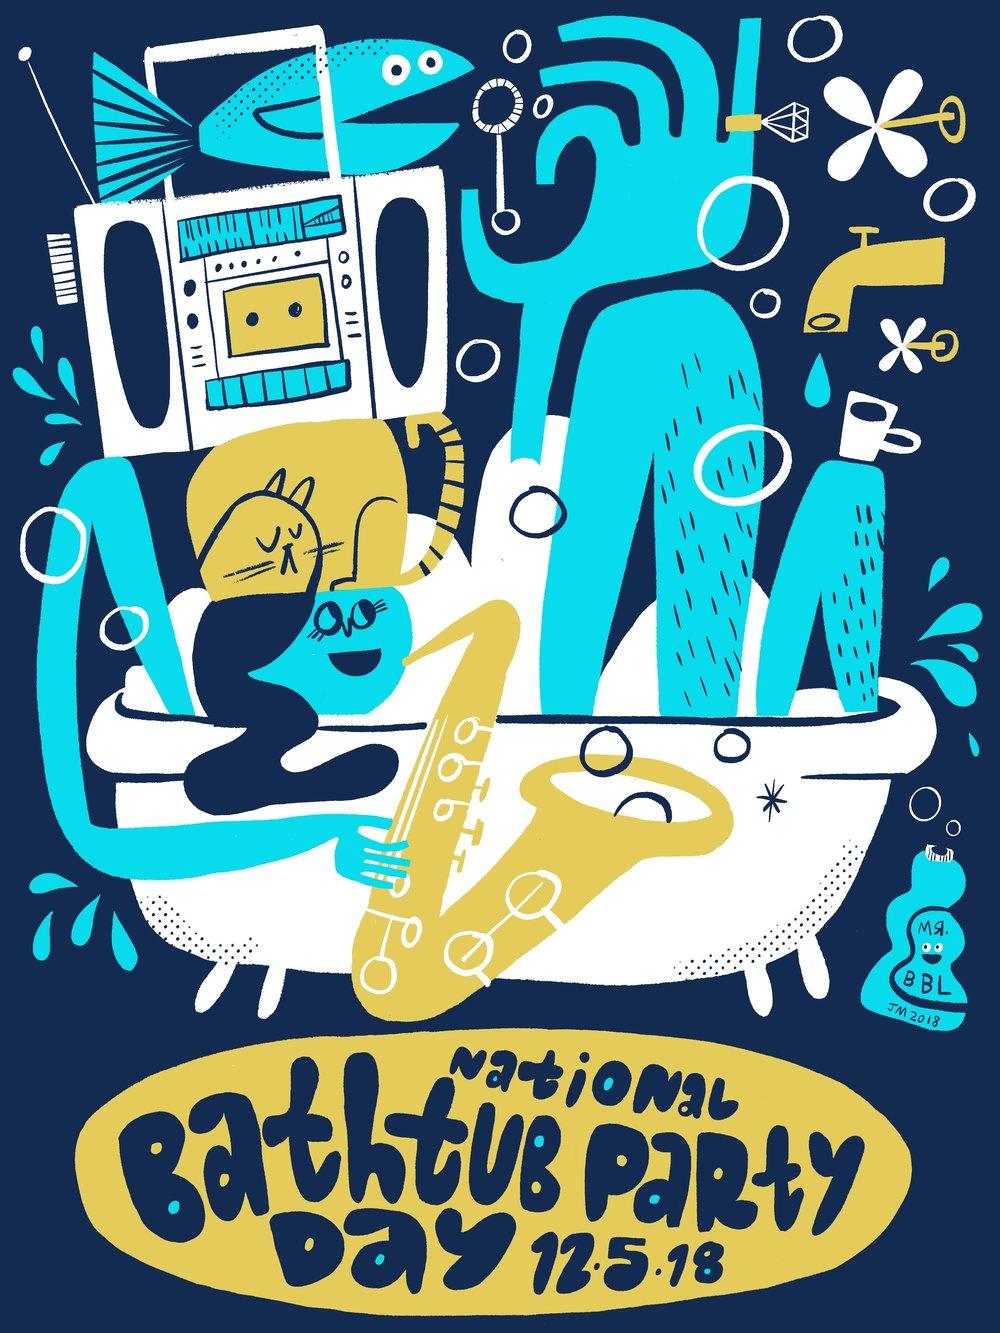 National Bathtub Party Day